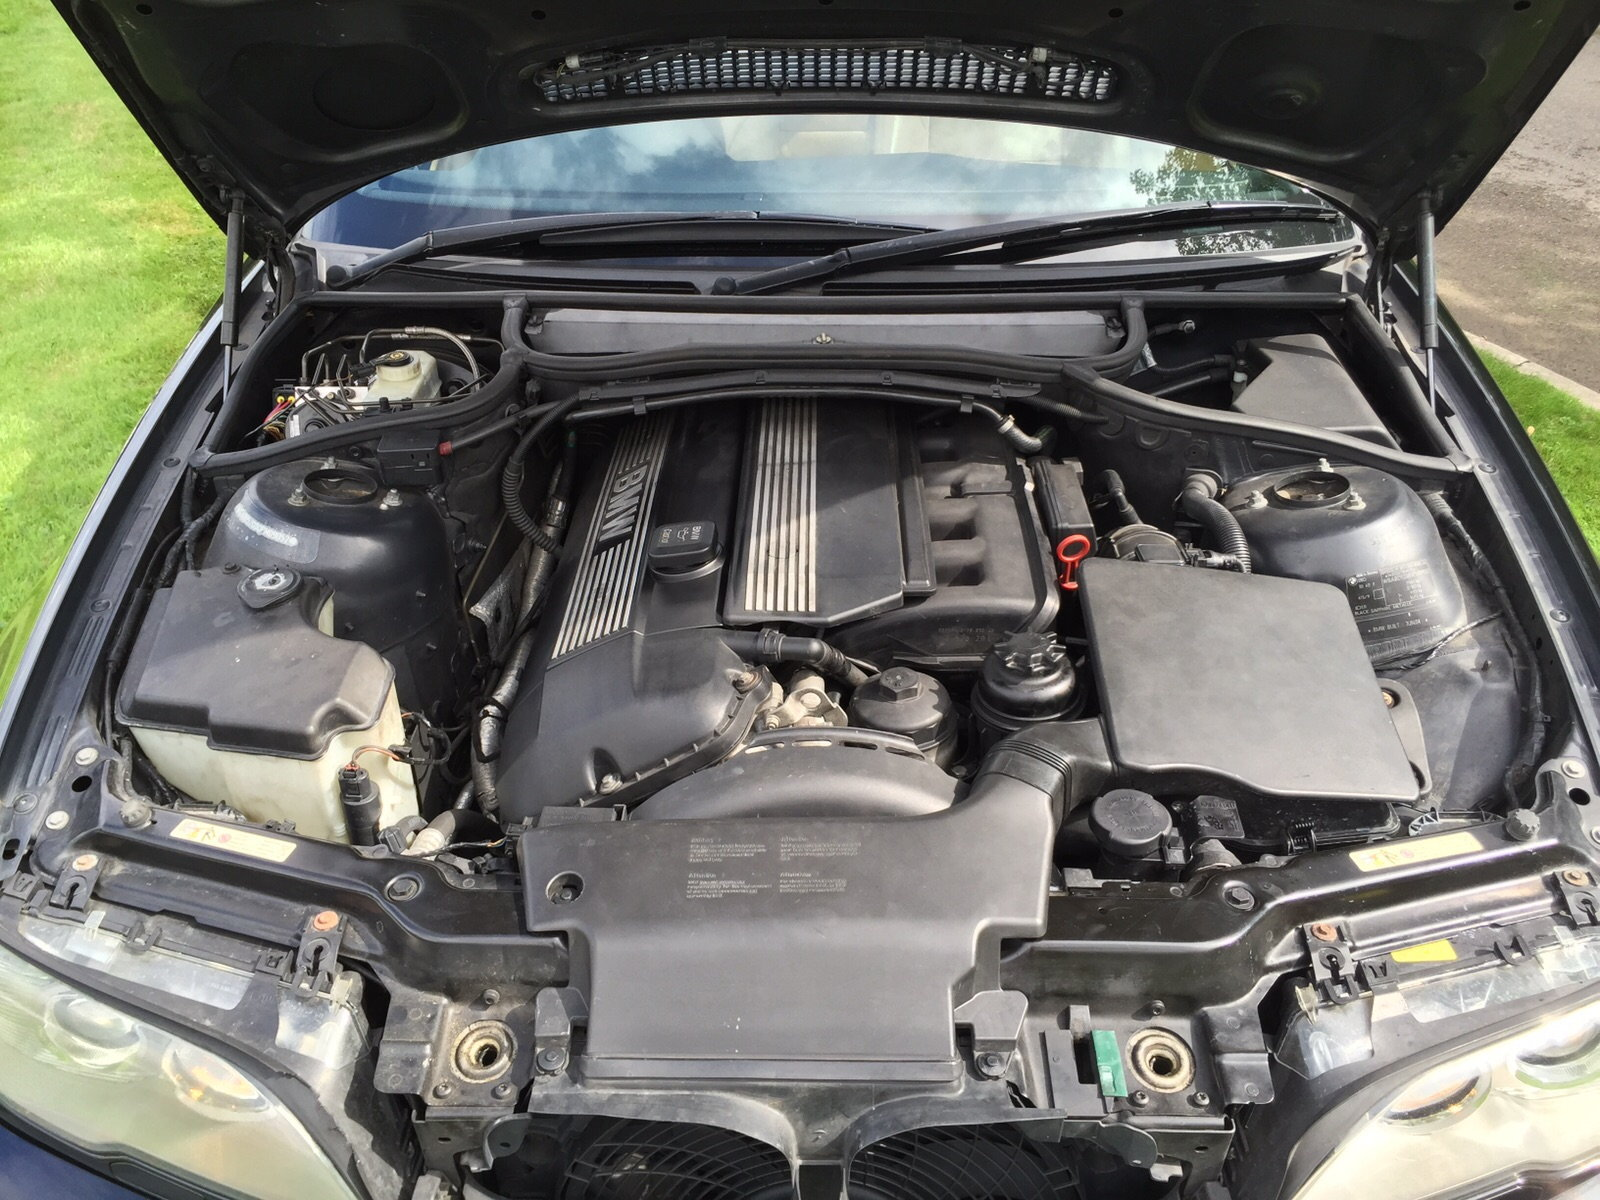 Renault Clio Sport 172 (03 reg) - common problems